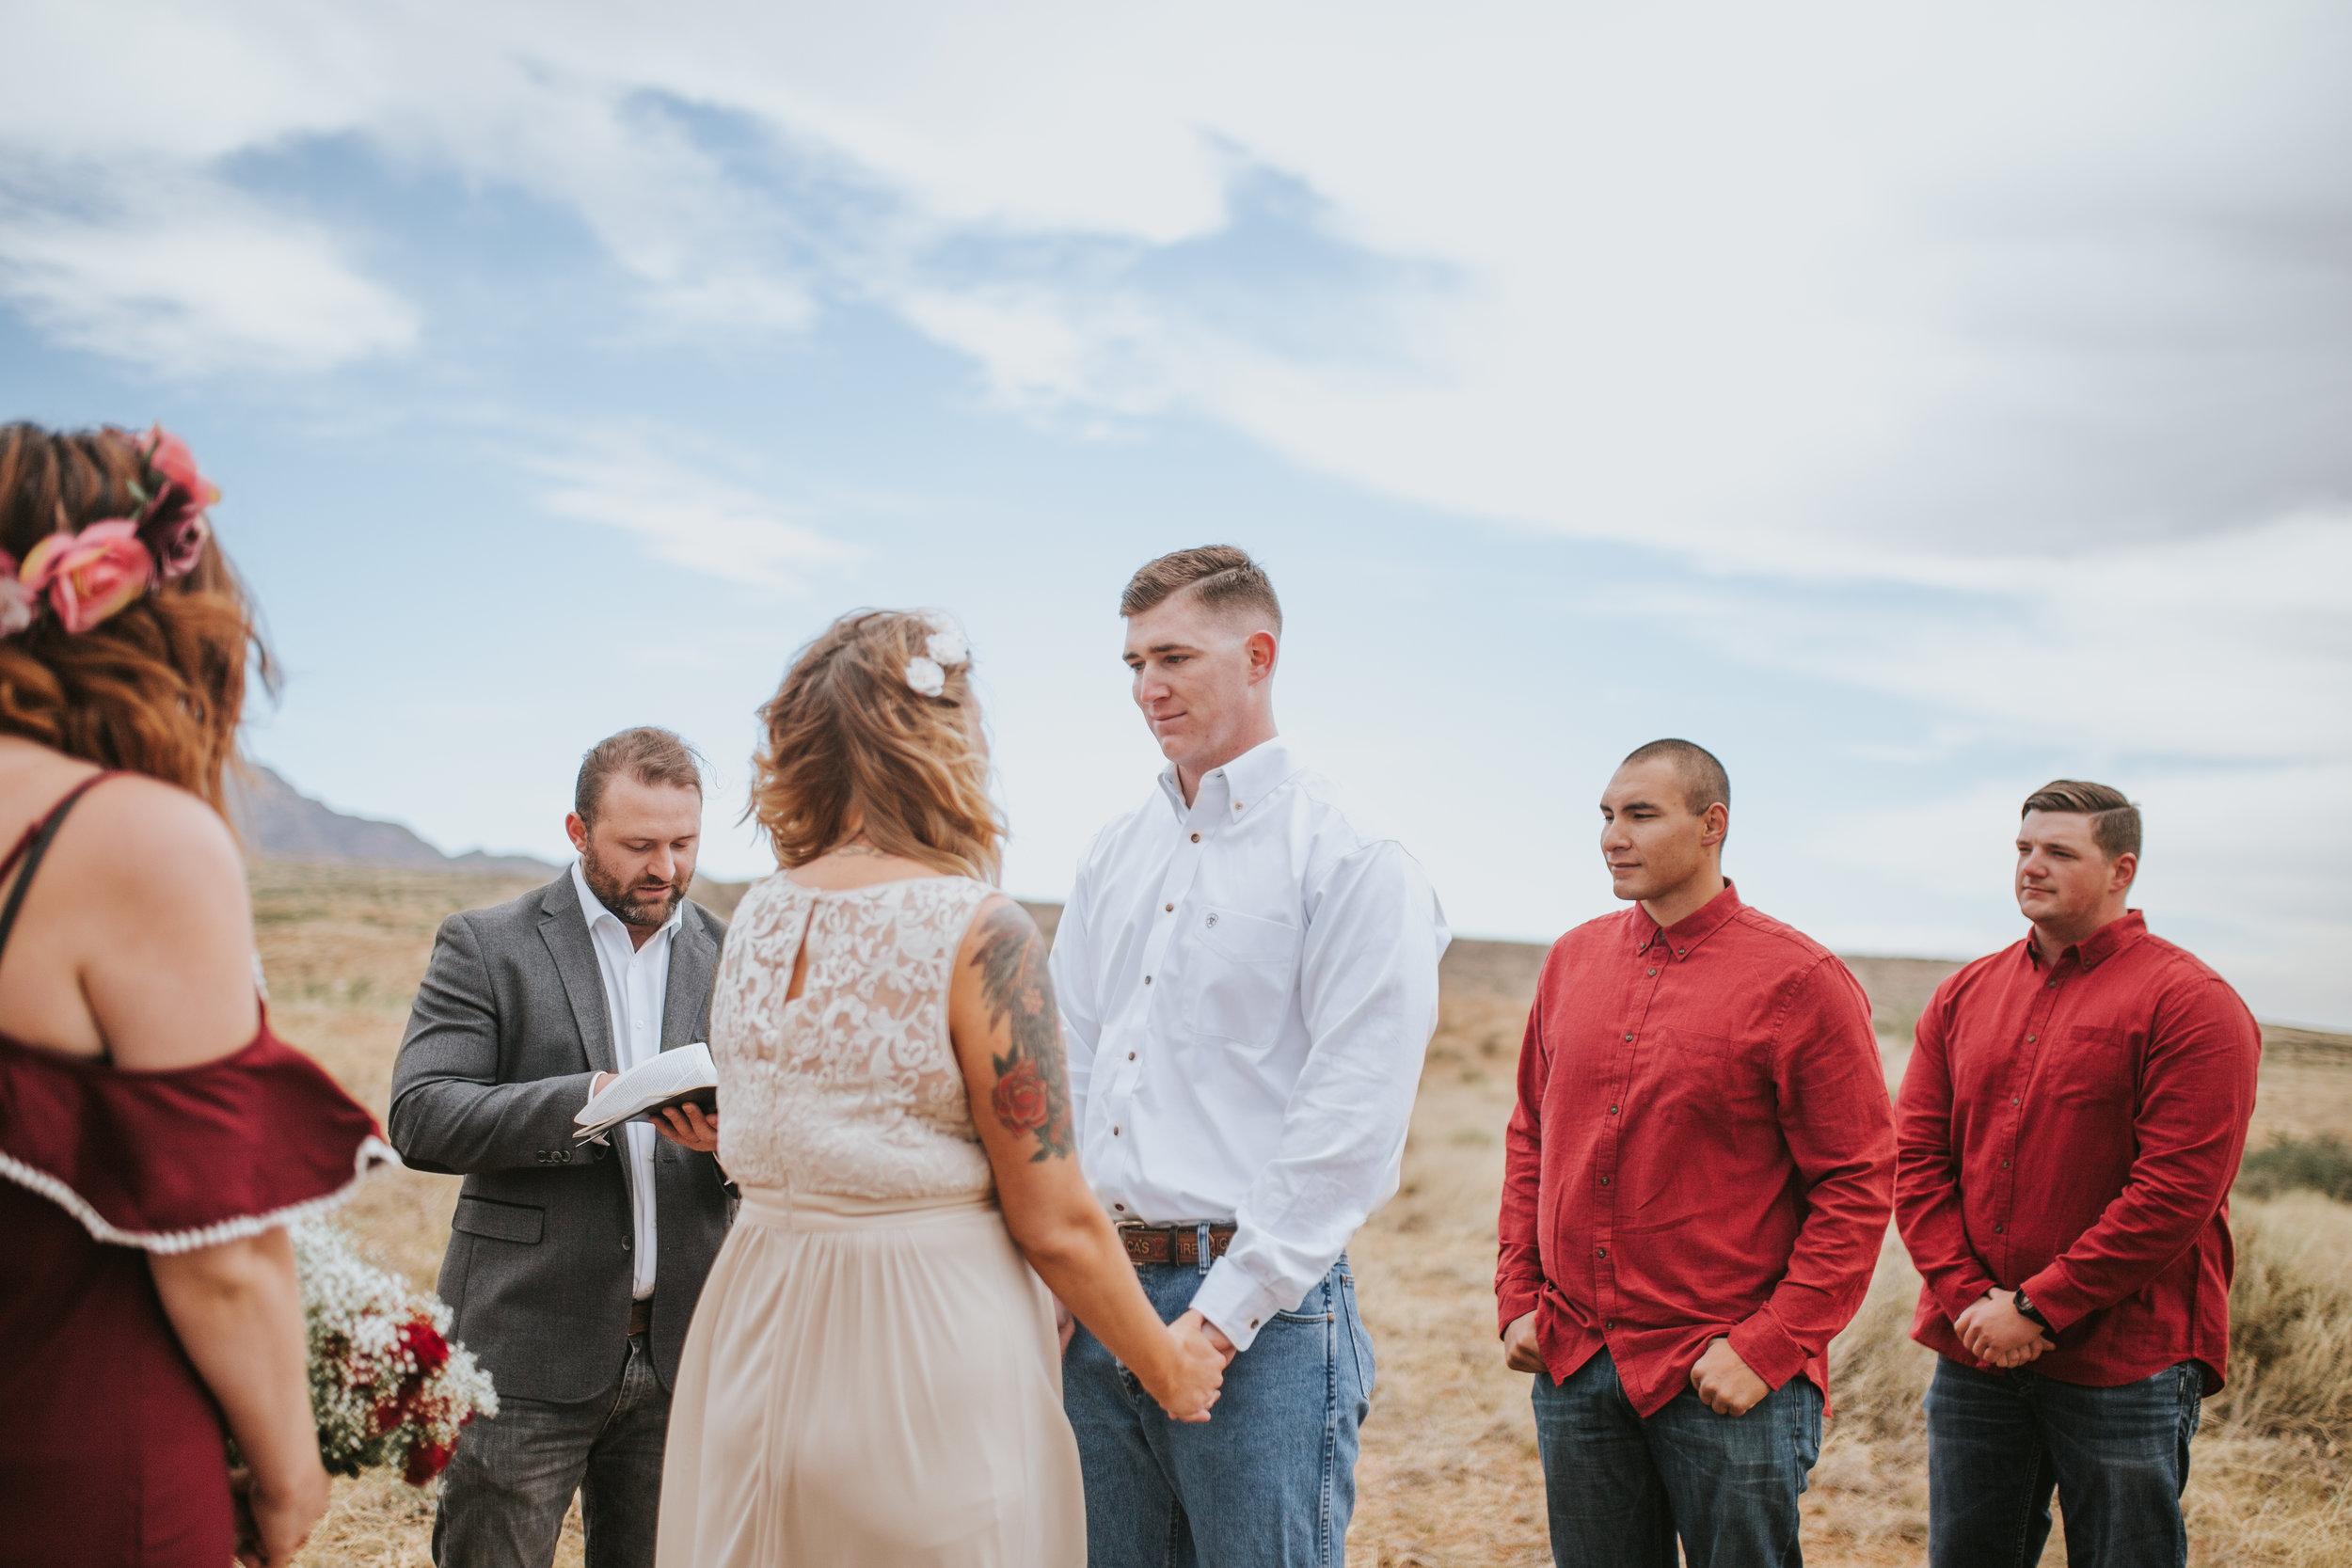 el-paso-texas-wedding-photographer-17